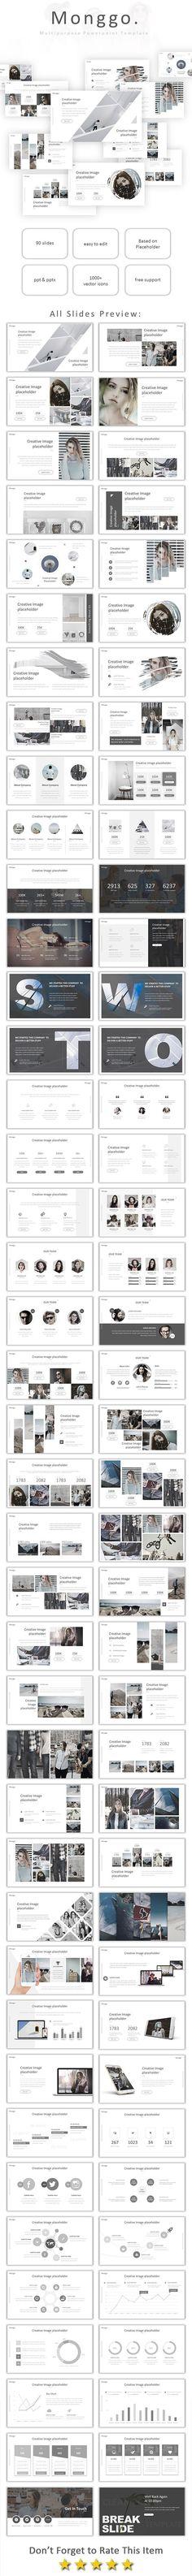 Monggo Powerpoint - Business PowerPoint Templates